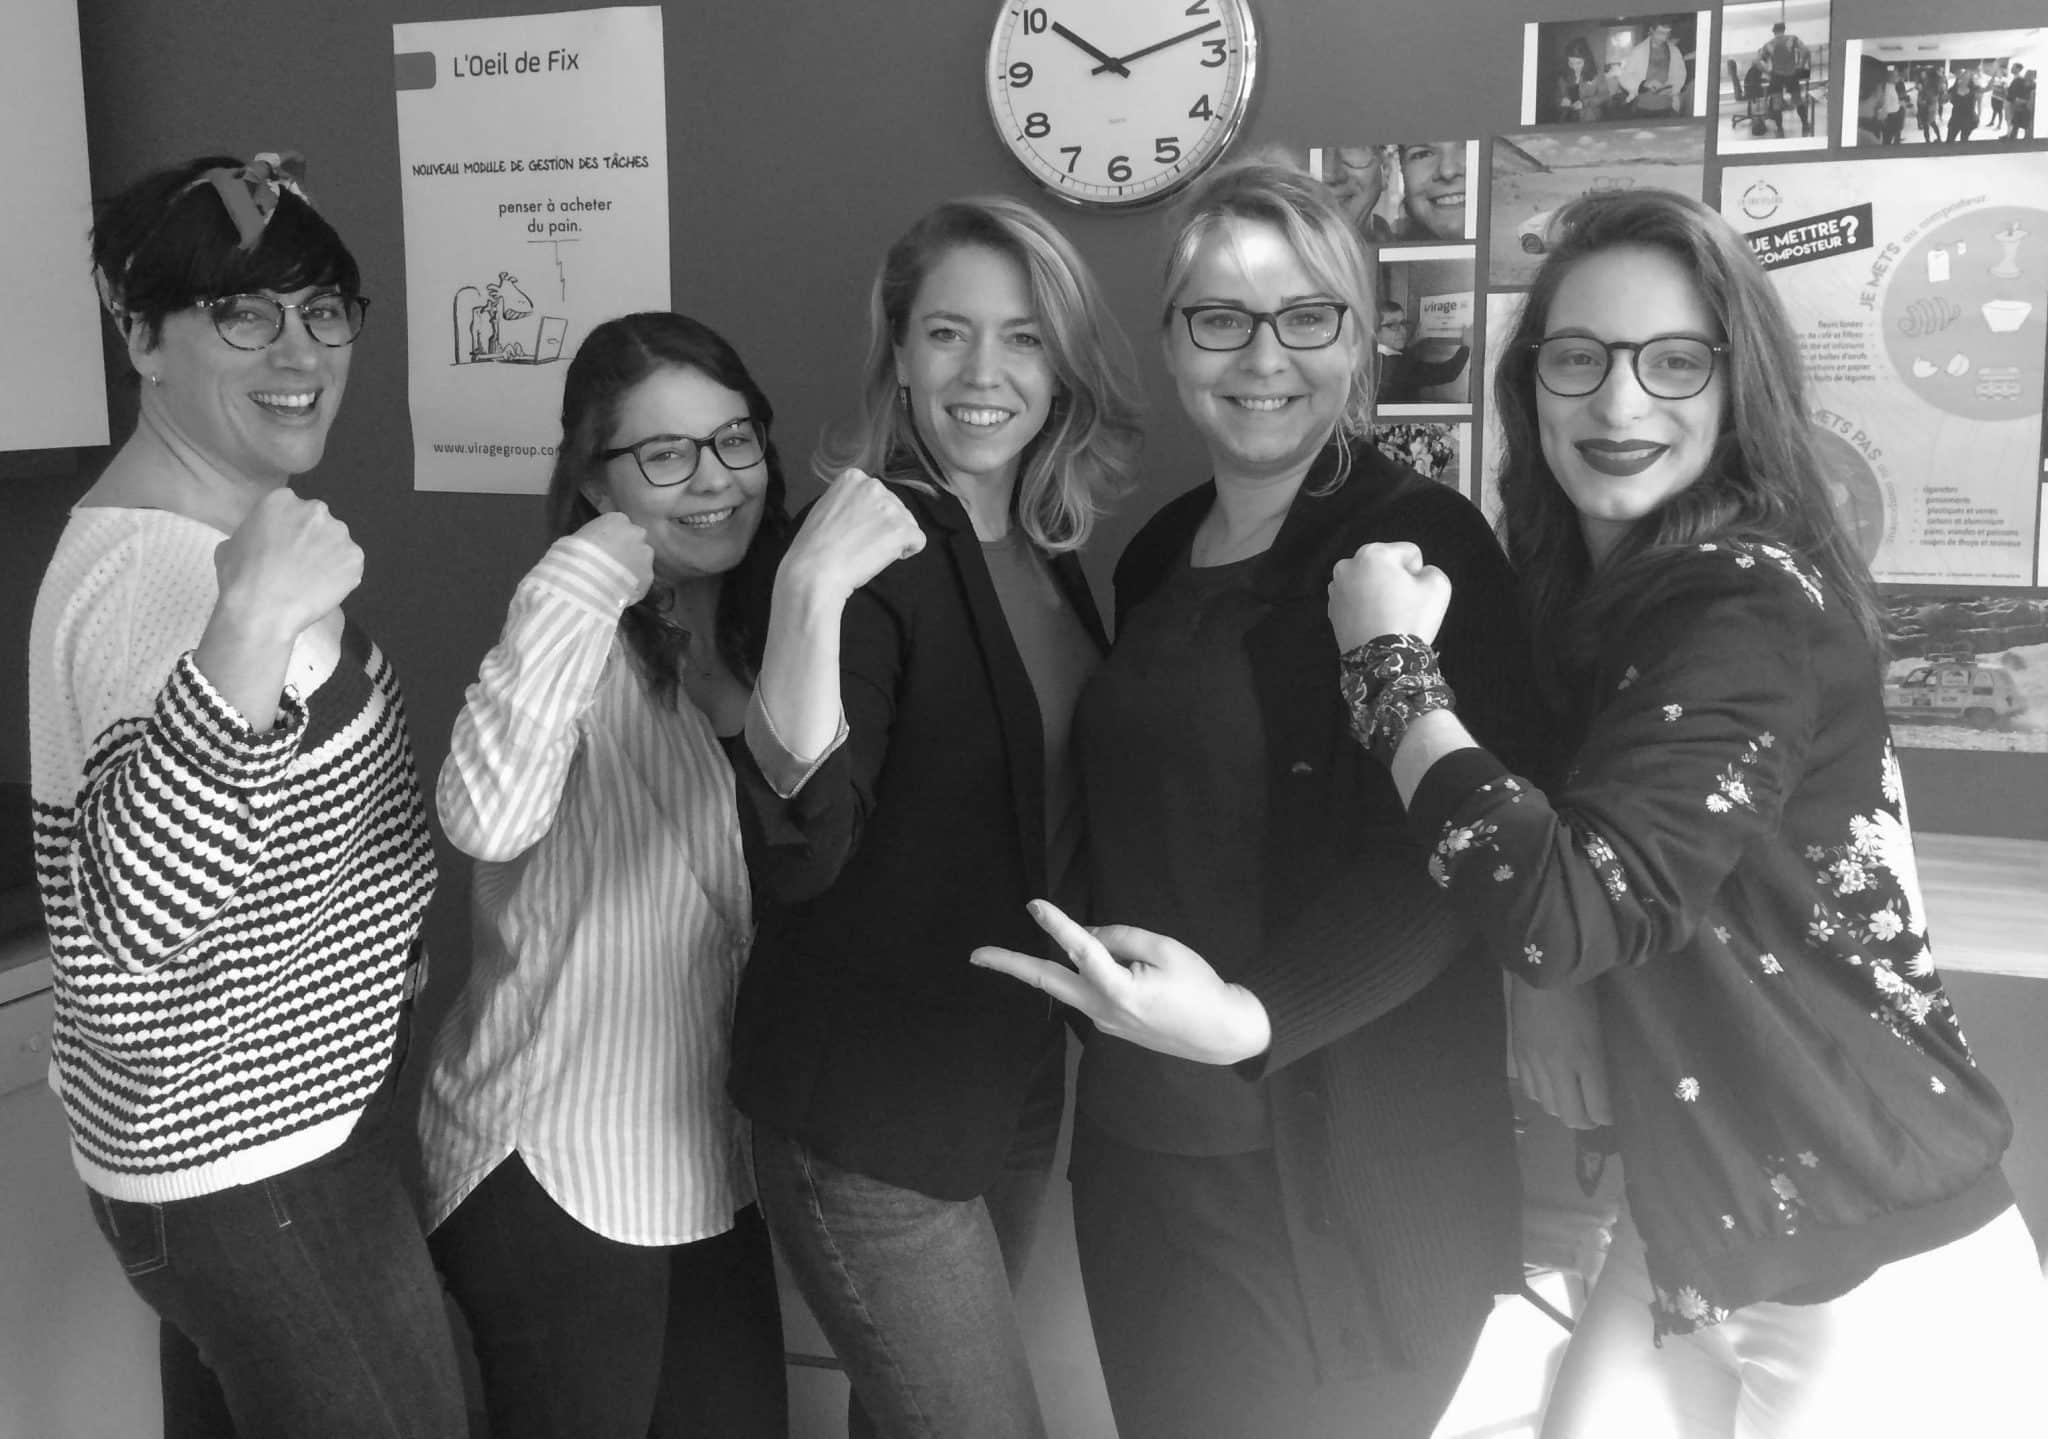 Equipe - femmes - IT - digital - VIRAGE Group - recrutement